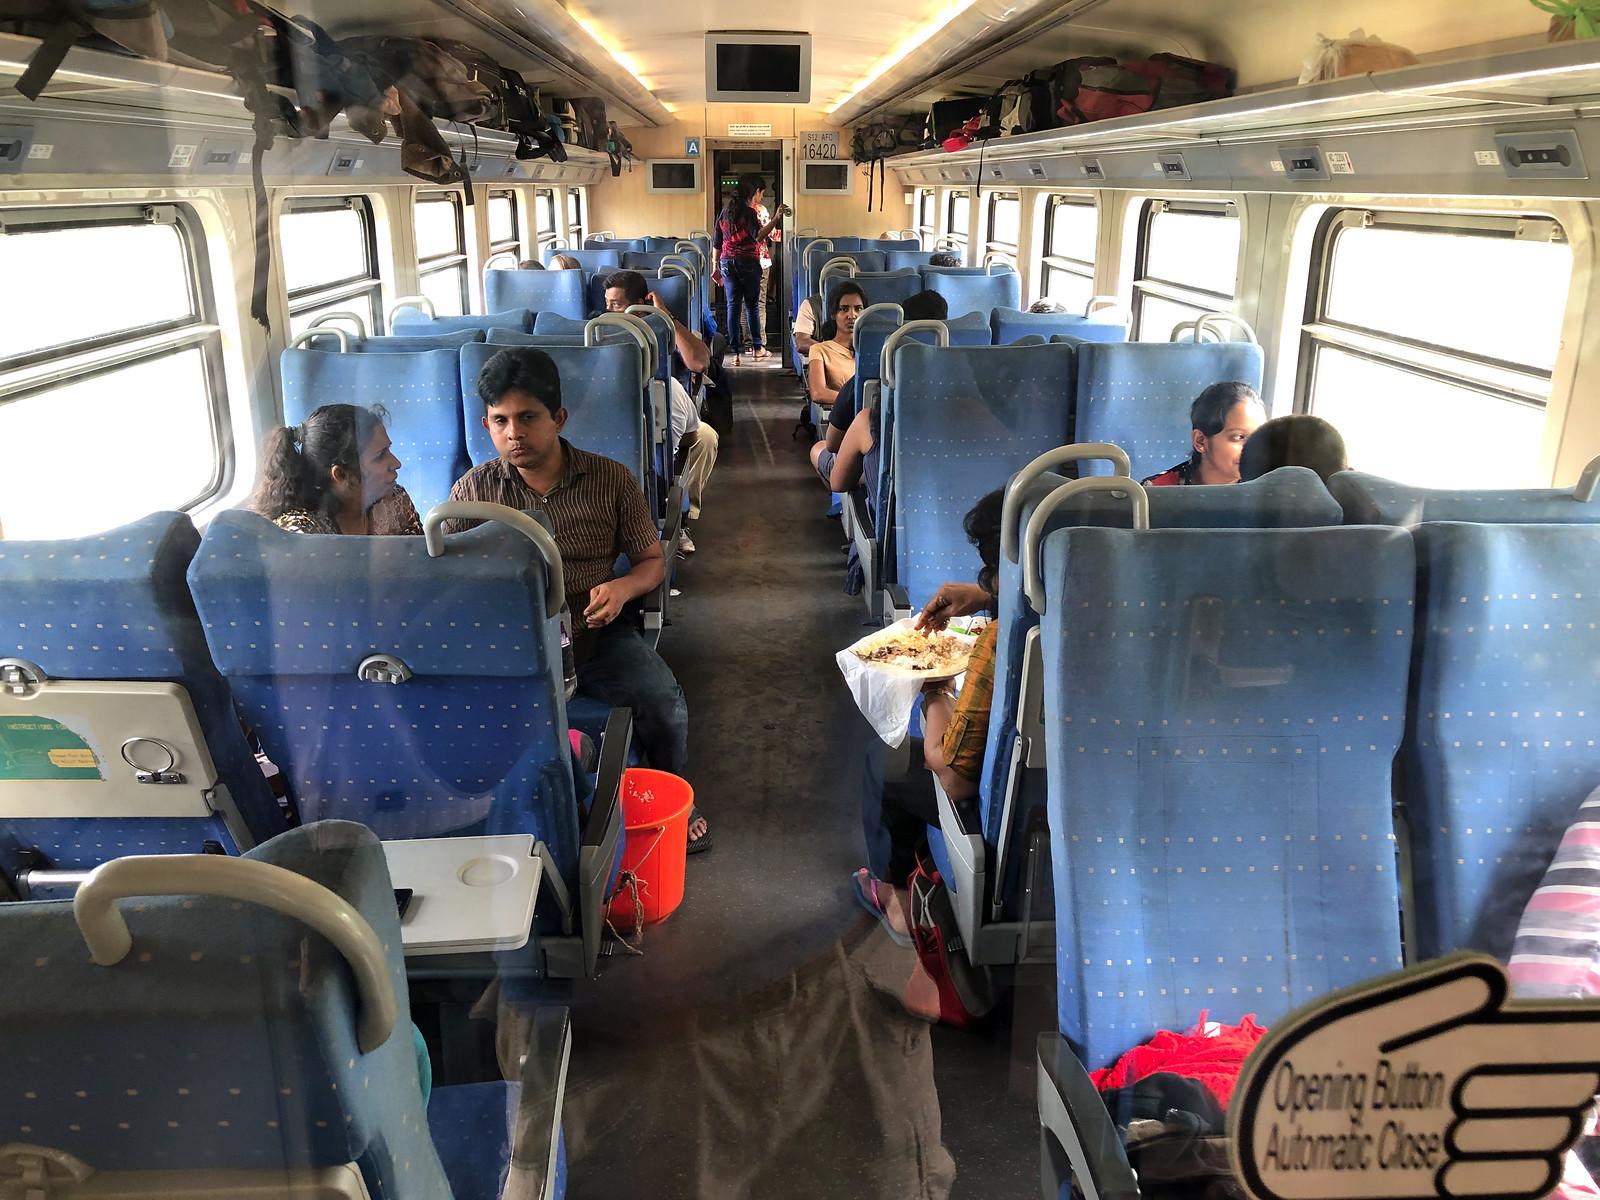 Tren de Ella, Ella Railway - Sri Lanka tren de ella - 33020661488 cd2e10db59 h - Tren de Ella en Sri Lanka: ¿El viaje en tren más pintoresco del mundo?